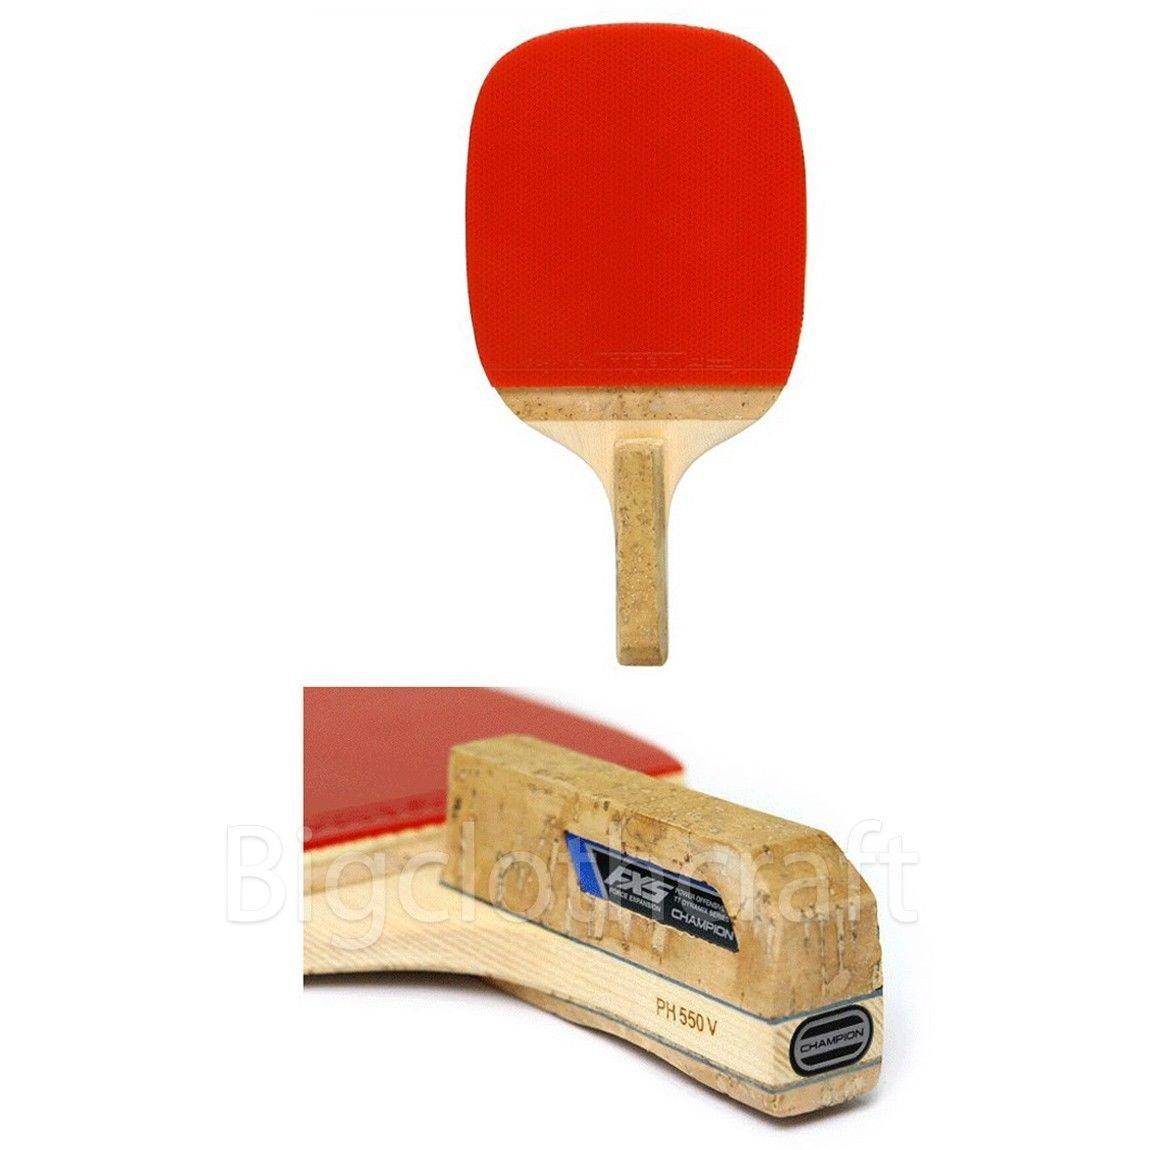 new CHAMPION PH550V Table Tennis Ping Pong Racket